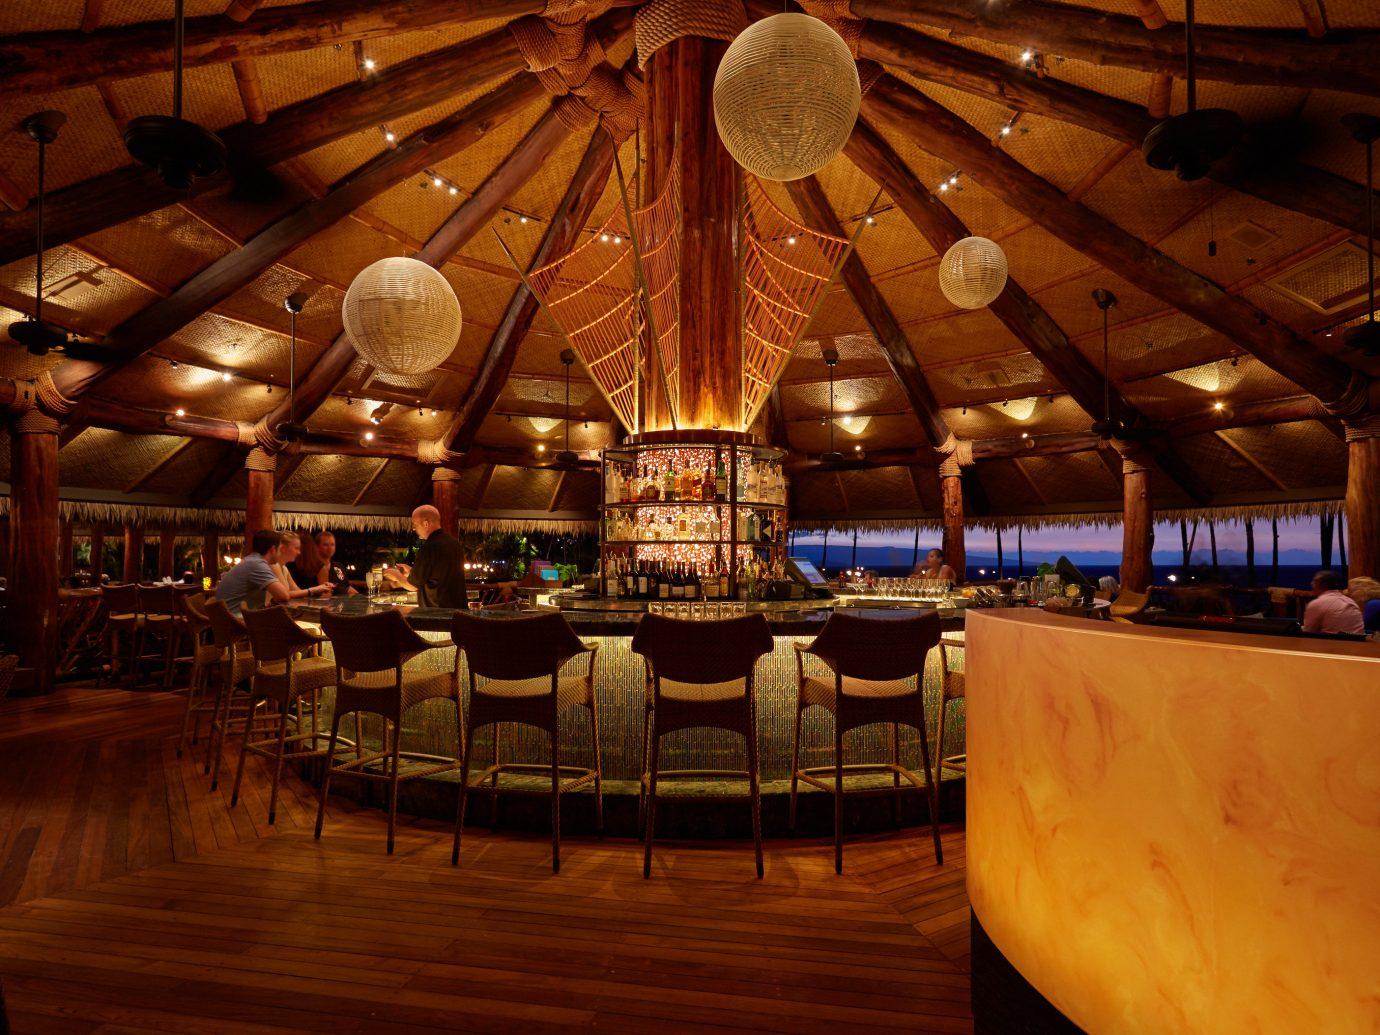 Trip Ideas ceiling indoor floor restaurant function hall lighting wood interior design several